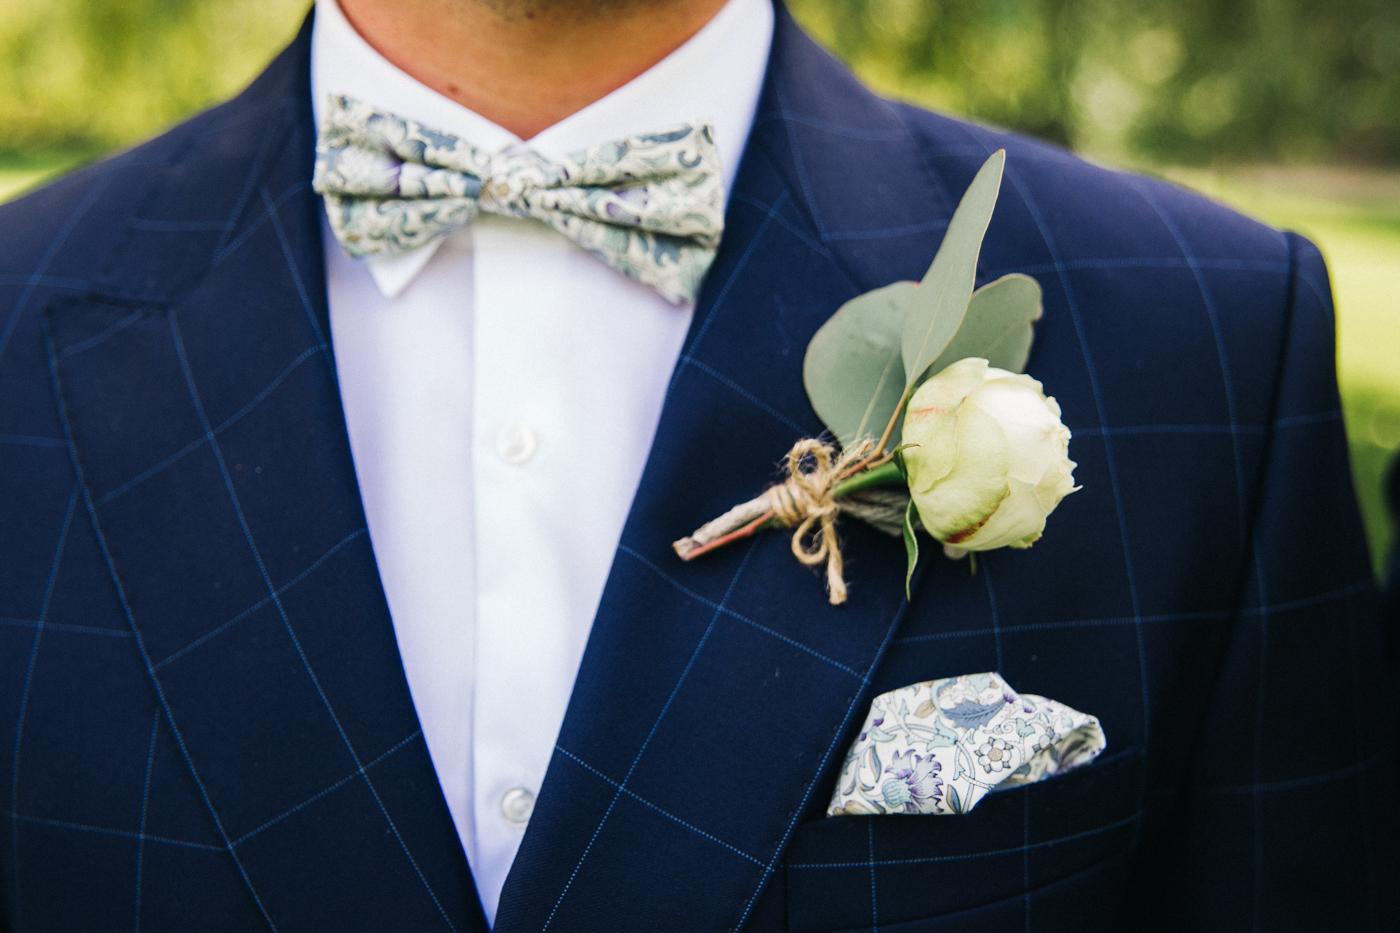 teesside-middlesbrough-north-east-wedding-photographer-creative-wedding-venues-0023.jpg